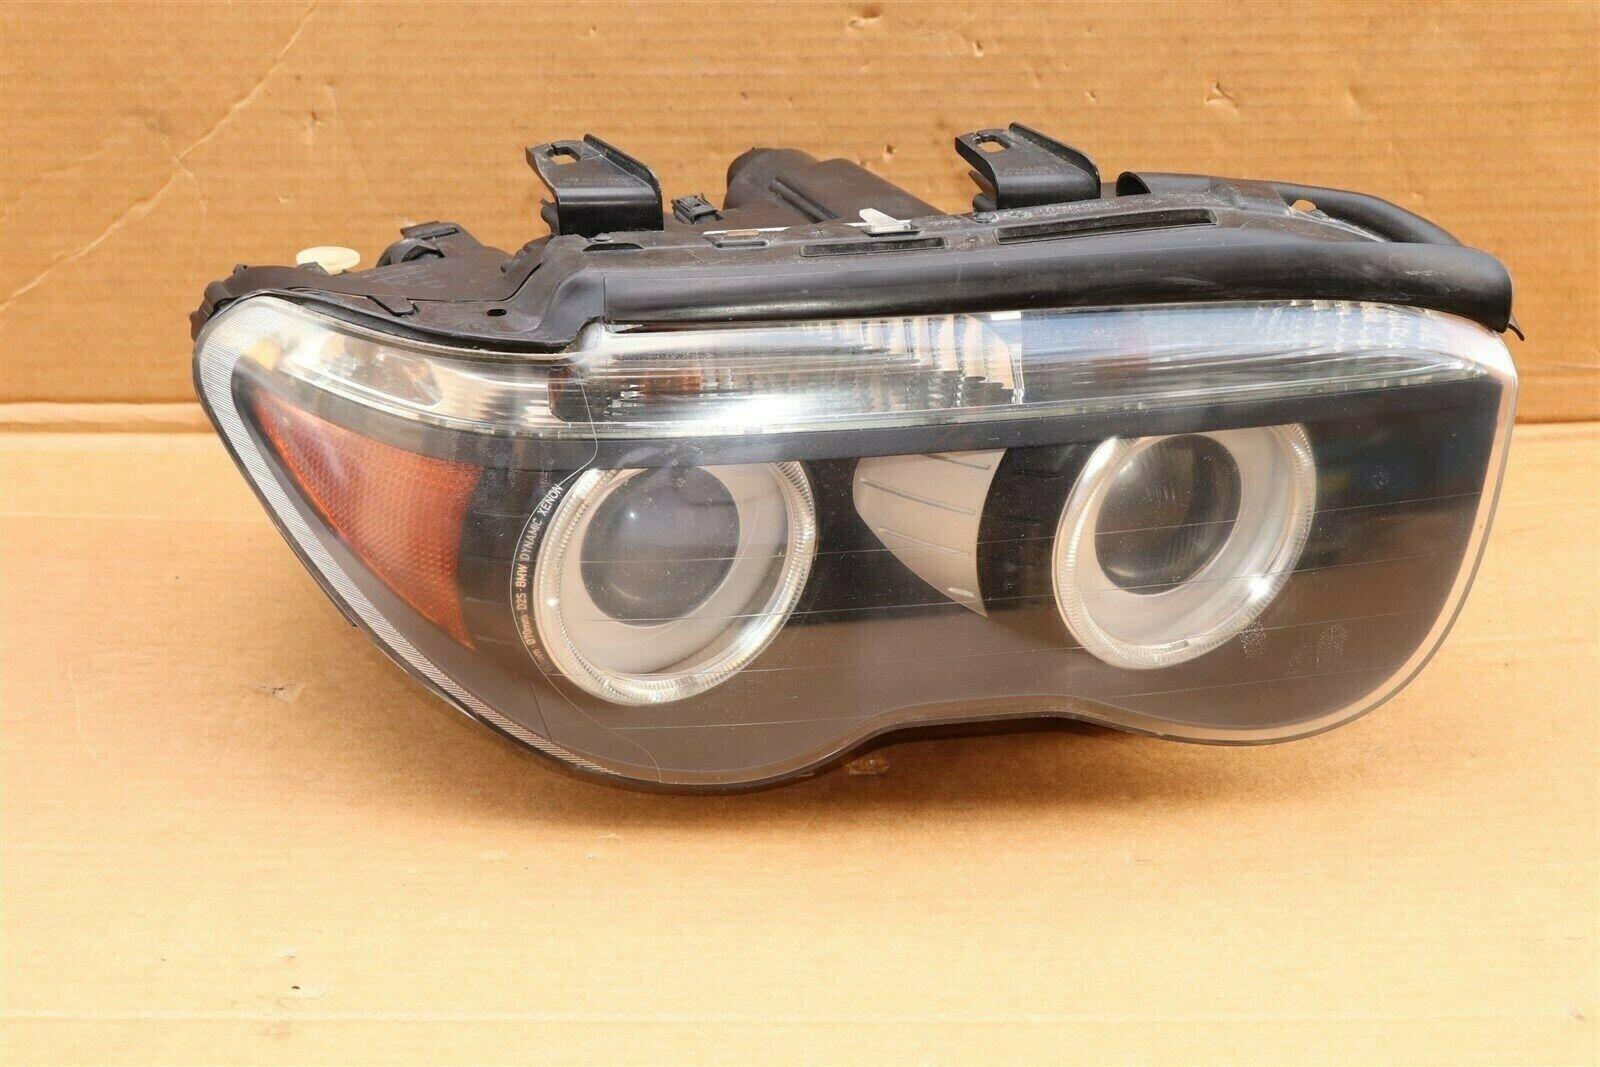 02-05 BMW E65 E66 745 750i 760i Xenon HID AFS Adaptive Headlight Pssngr Right RH